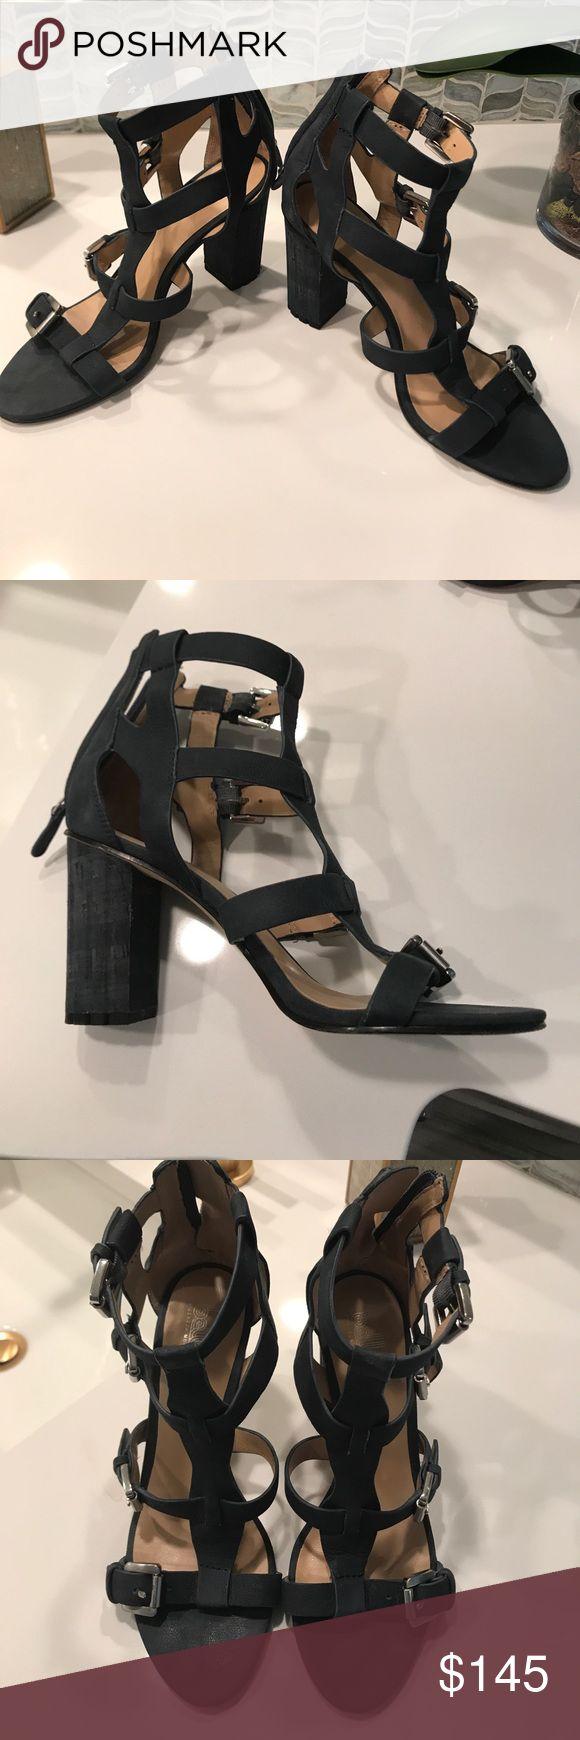 Sigerson Morrison Gladiator Sandal Sigerson Morrison Women's navy blue leather gladiator sandal. Back zipper. Slightly worn but in great condition. No marks at all. Sigerson Morrison Shoes Sandals